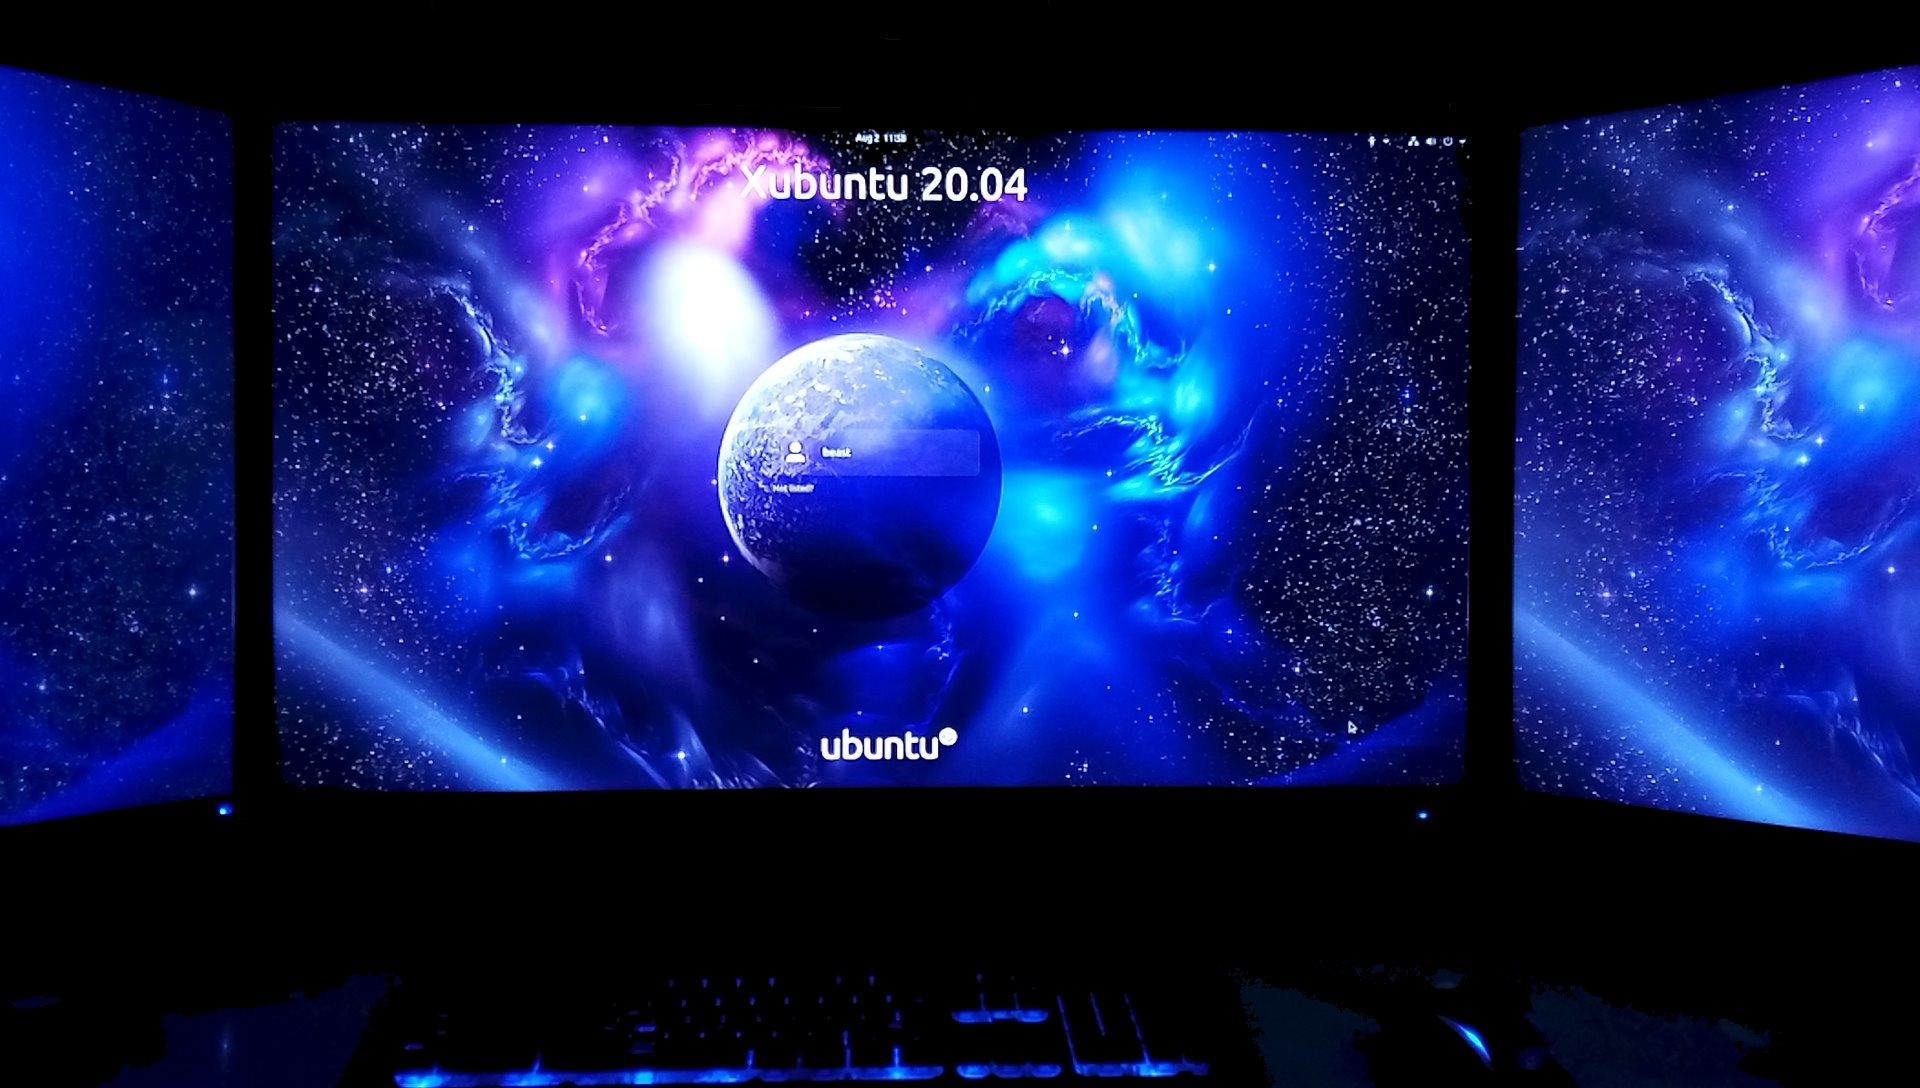 New Ubuntu login screen